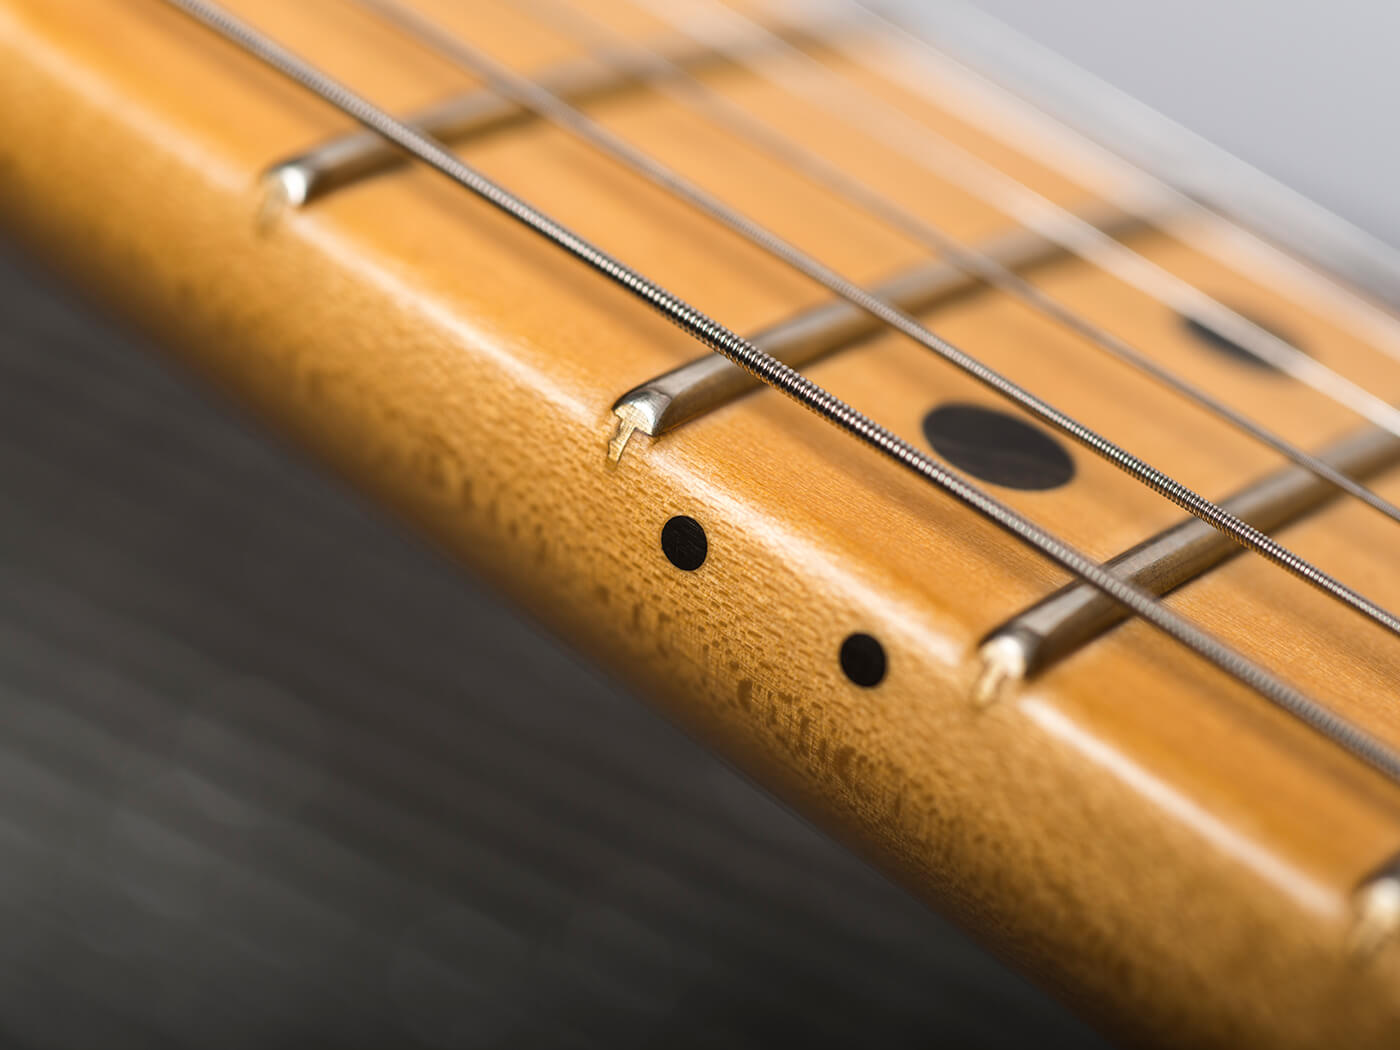 Fender American Ultra Telecaster (Fretboard)